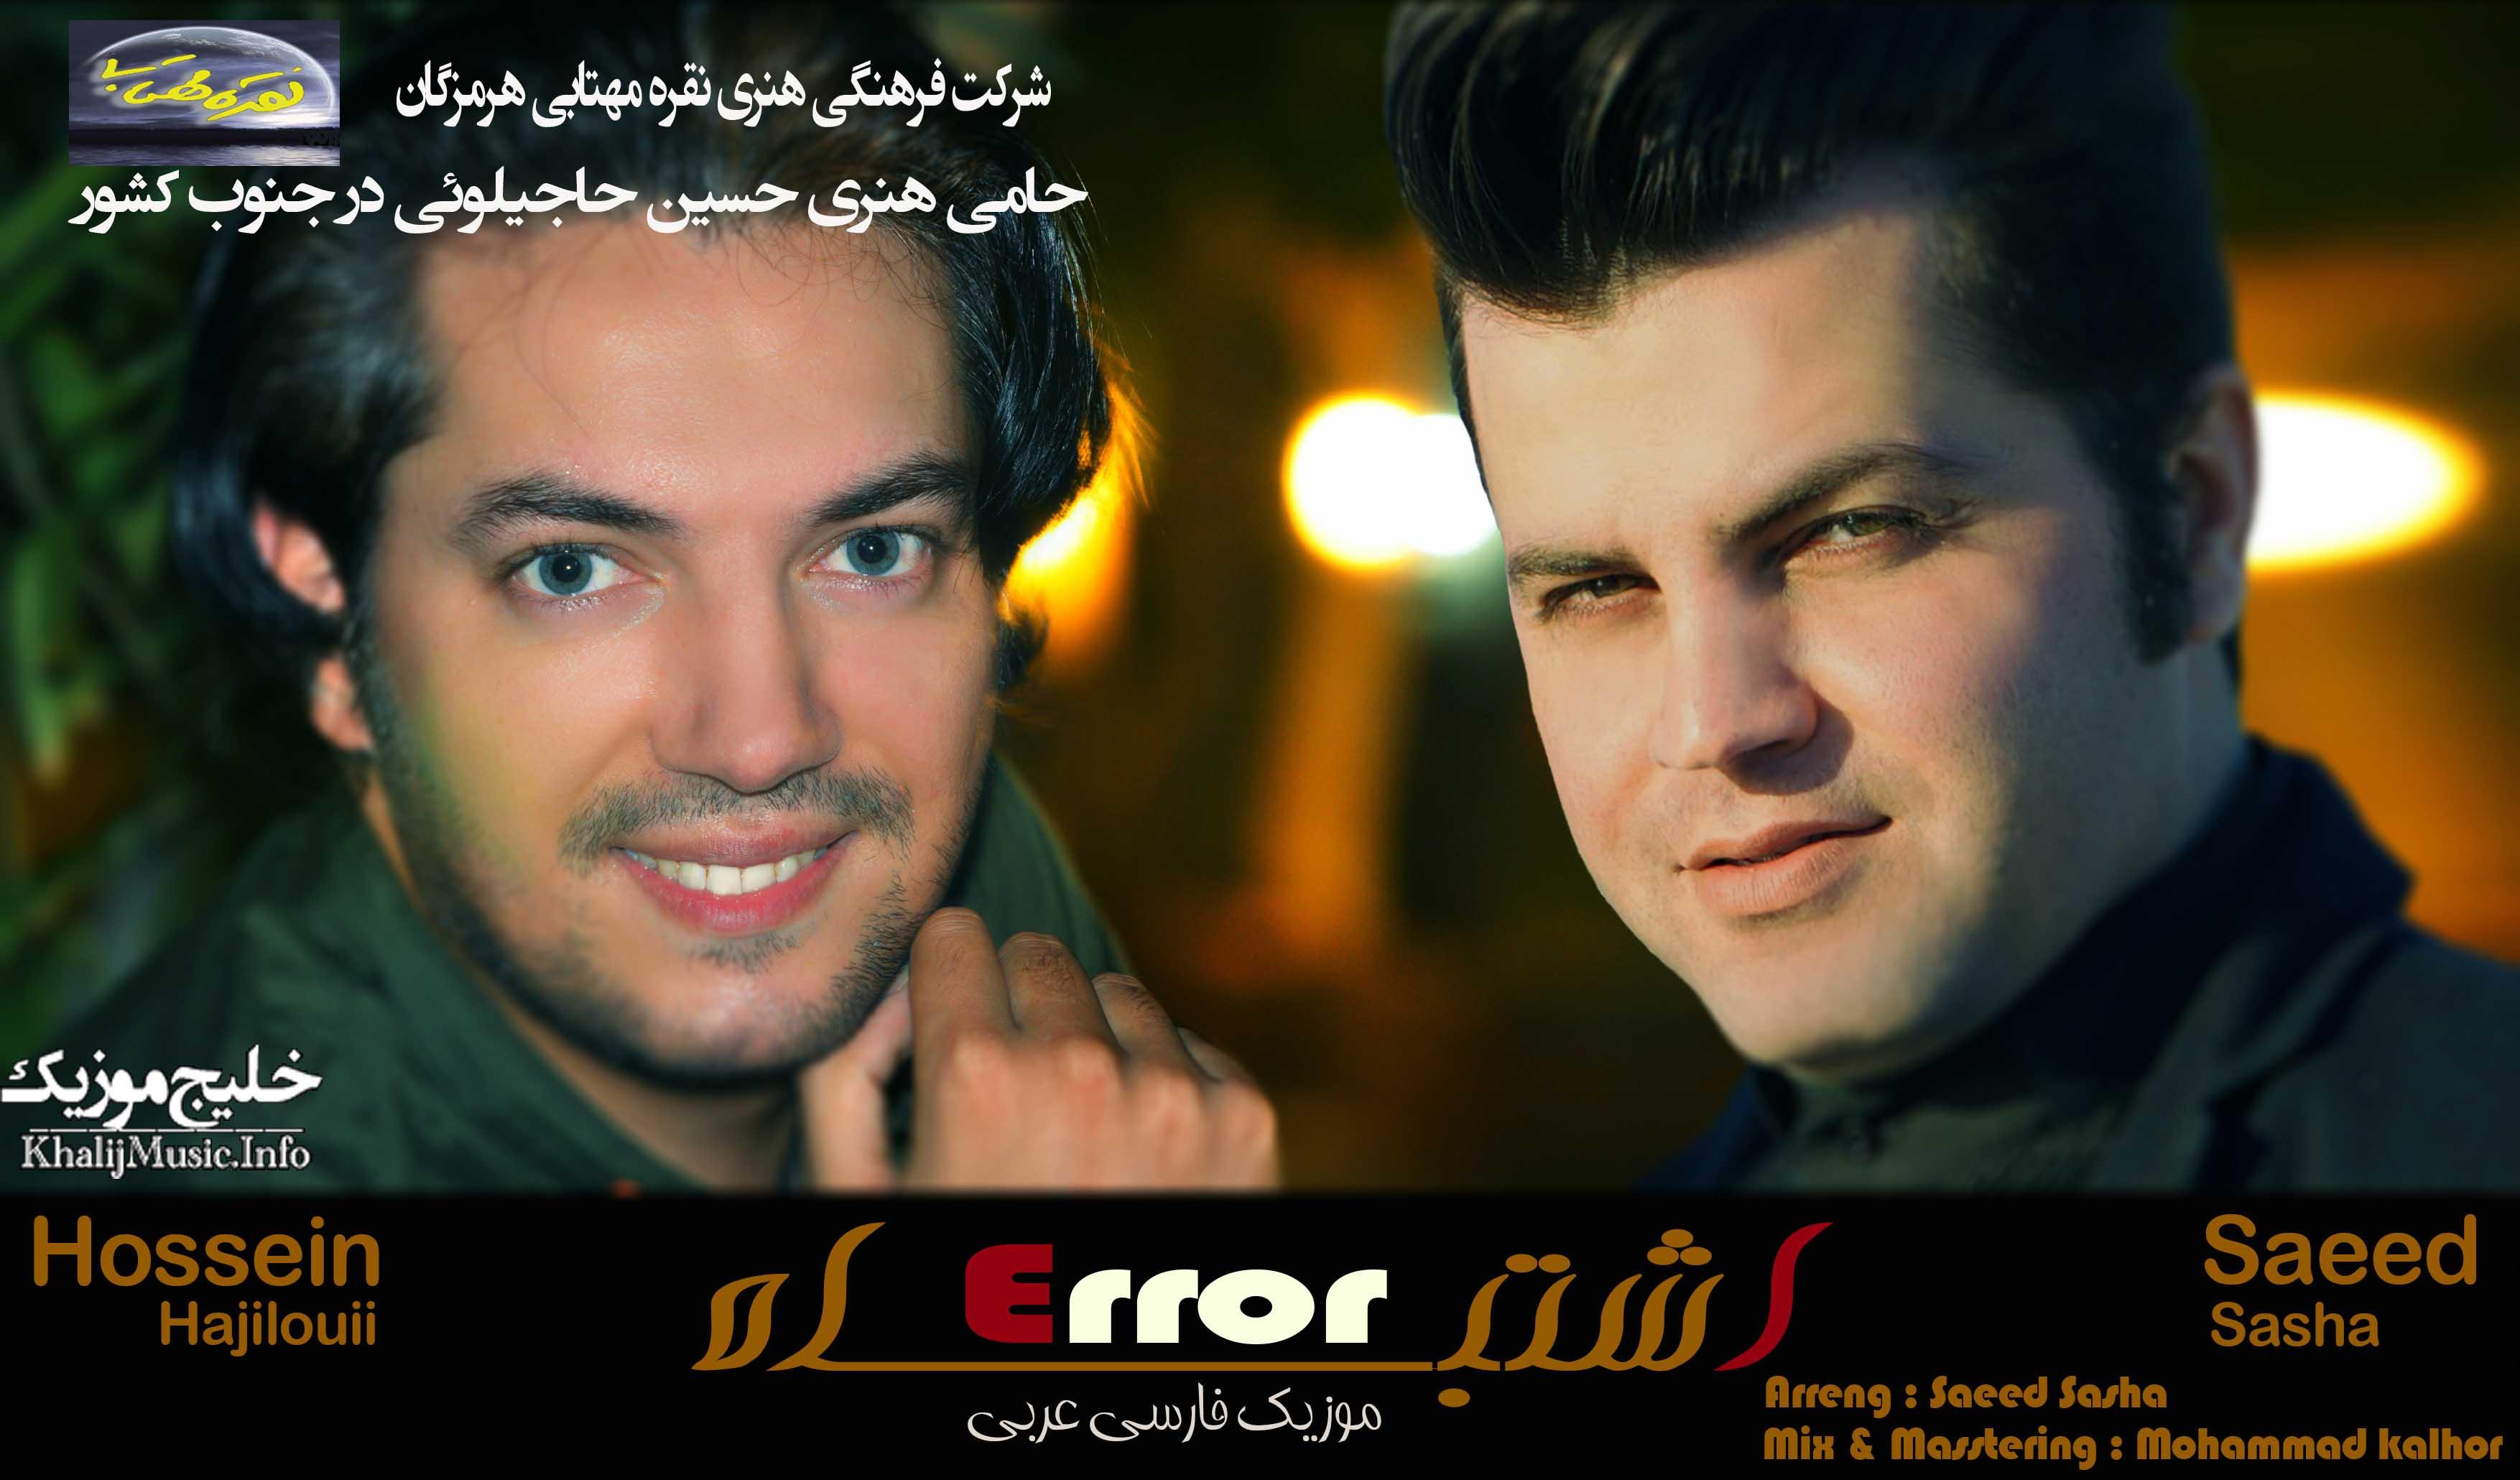 حسین حاجیلوئی و سعید ساشا – اشتباه